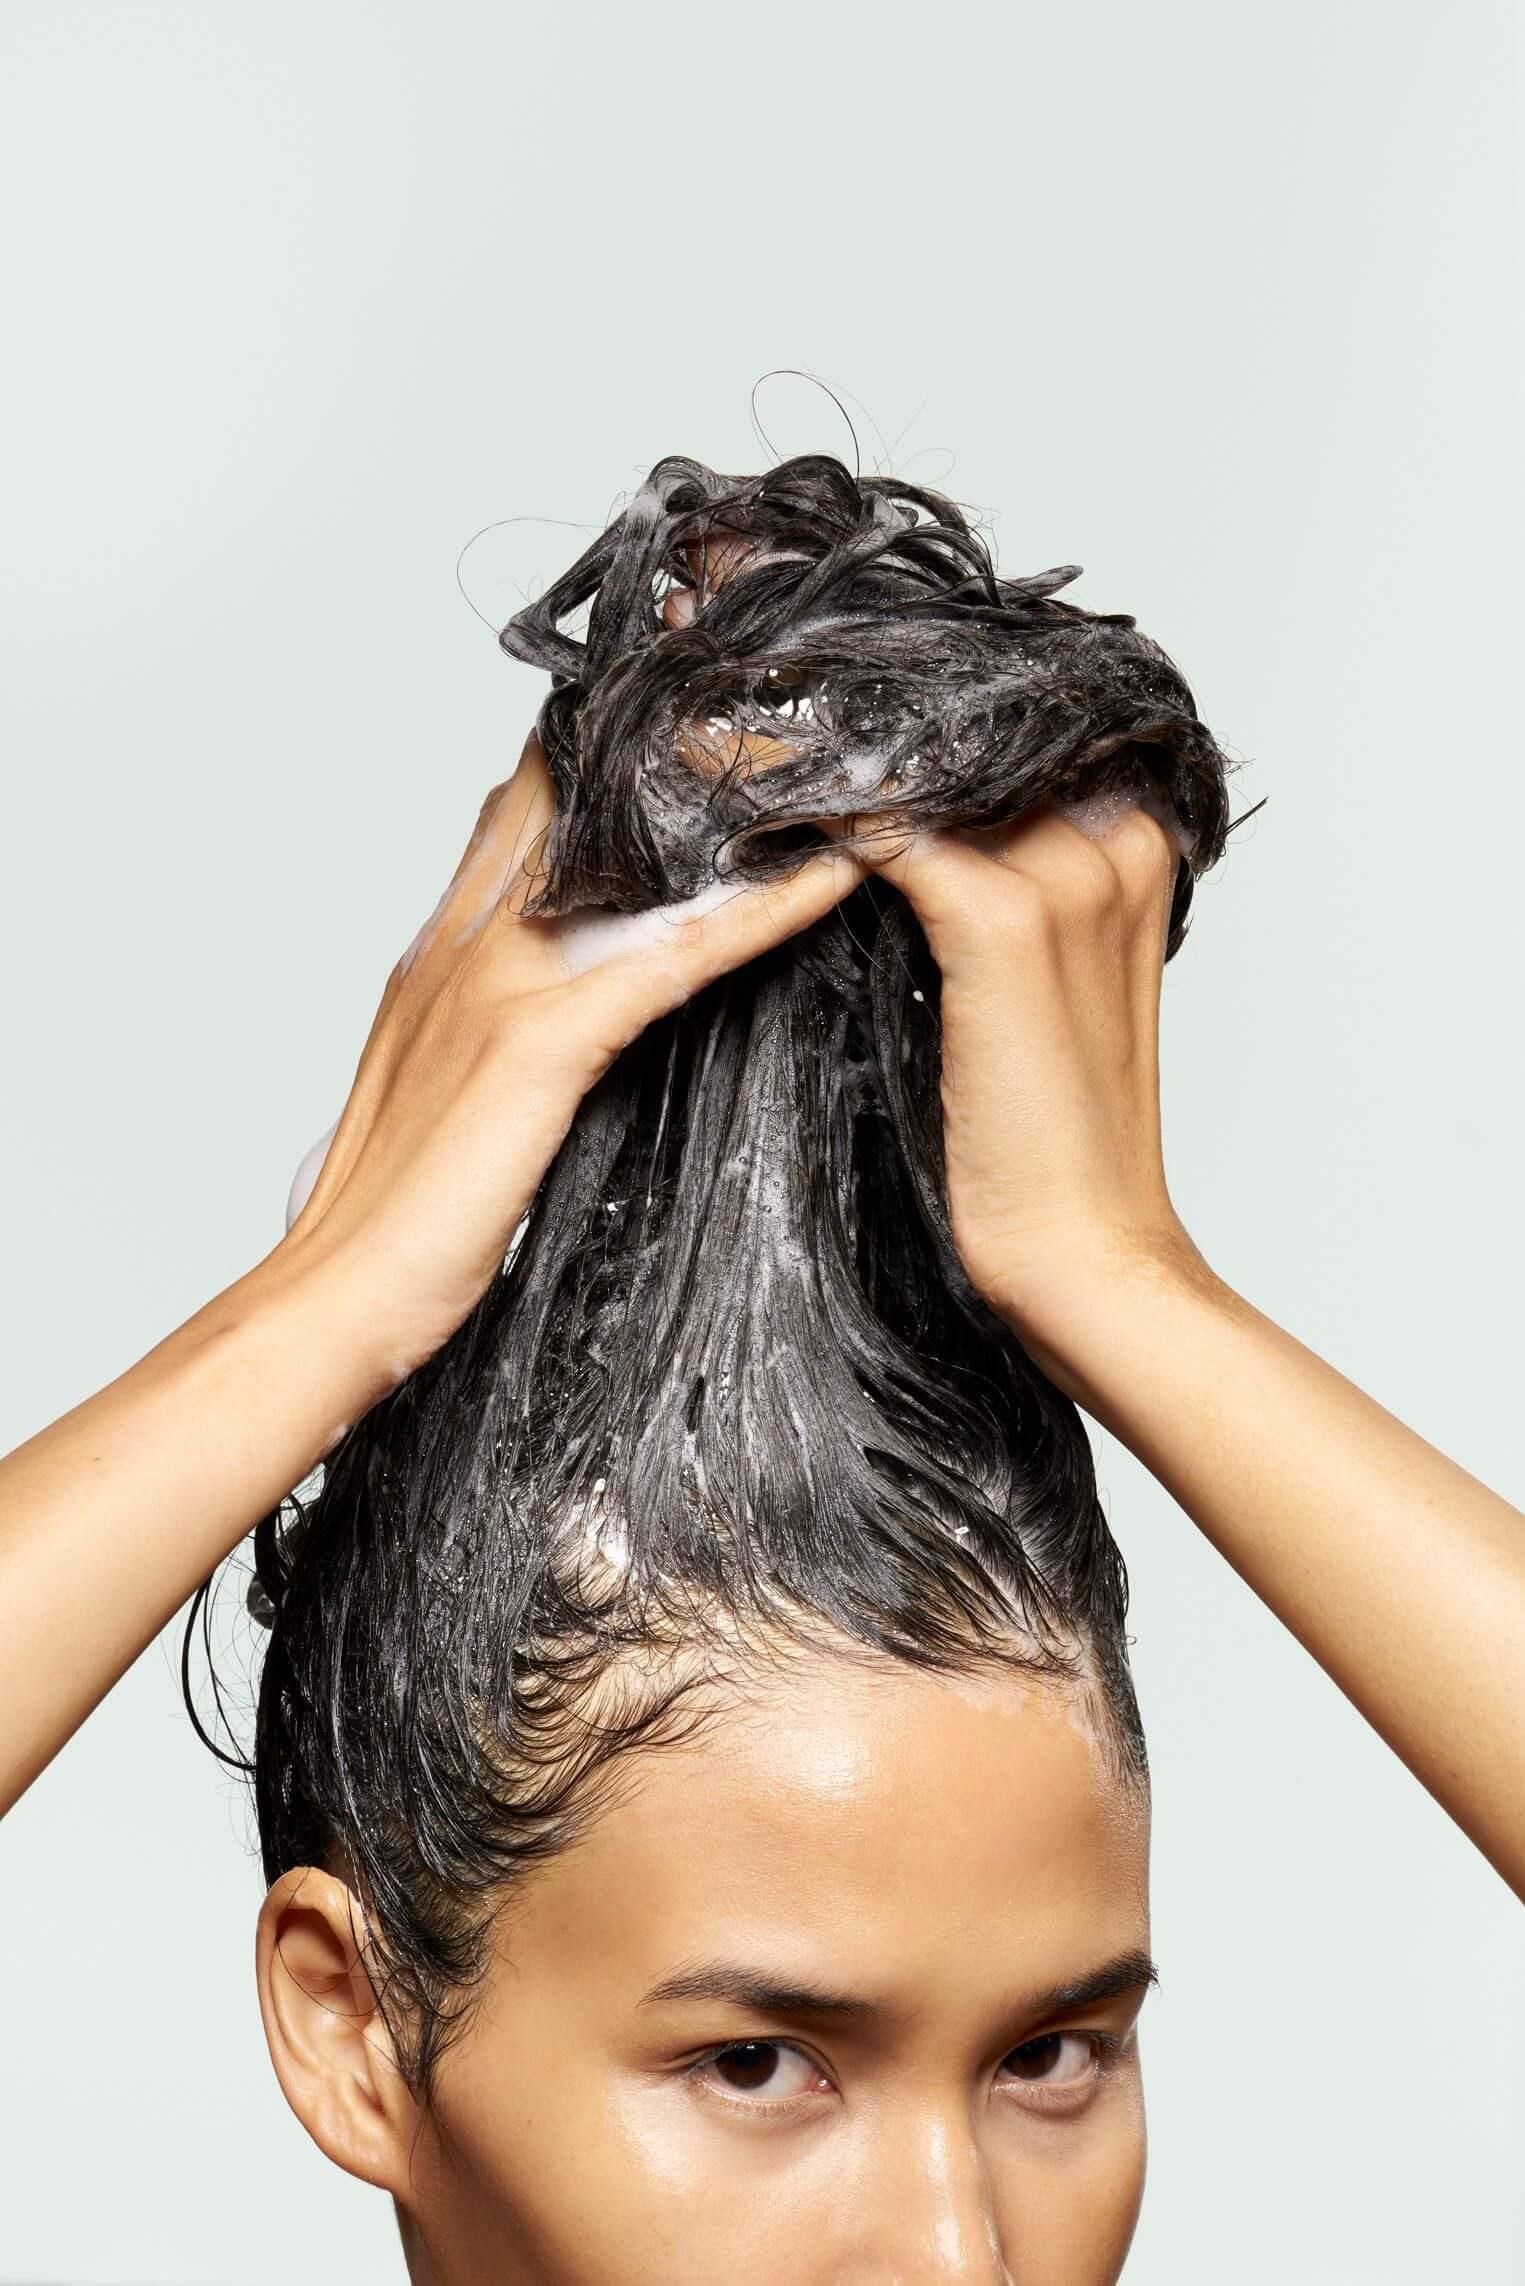 Does Biotin Shampoo Help Thinning Hair?